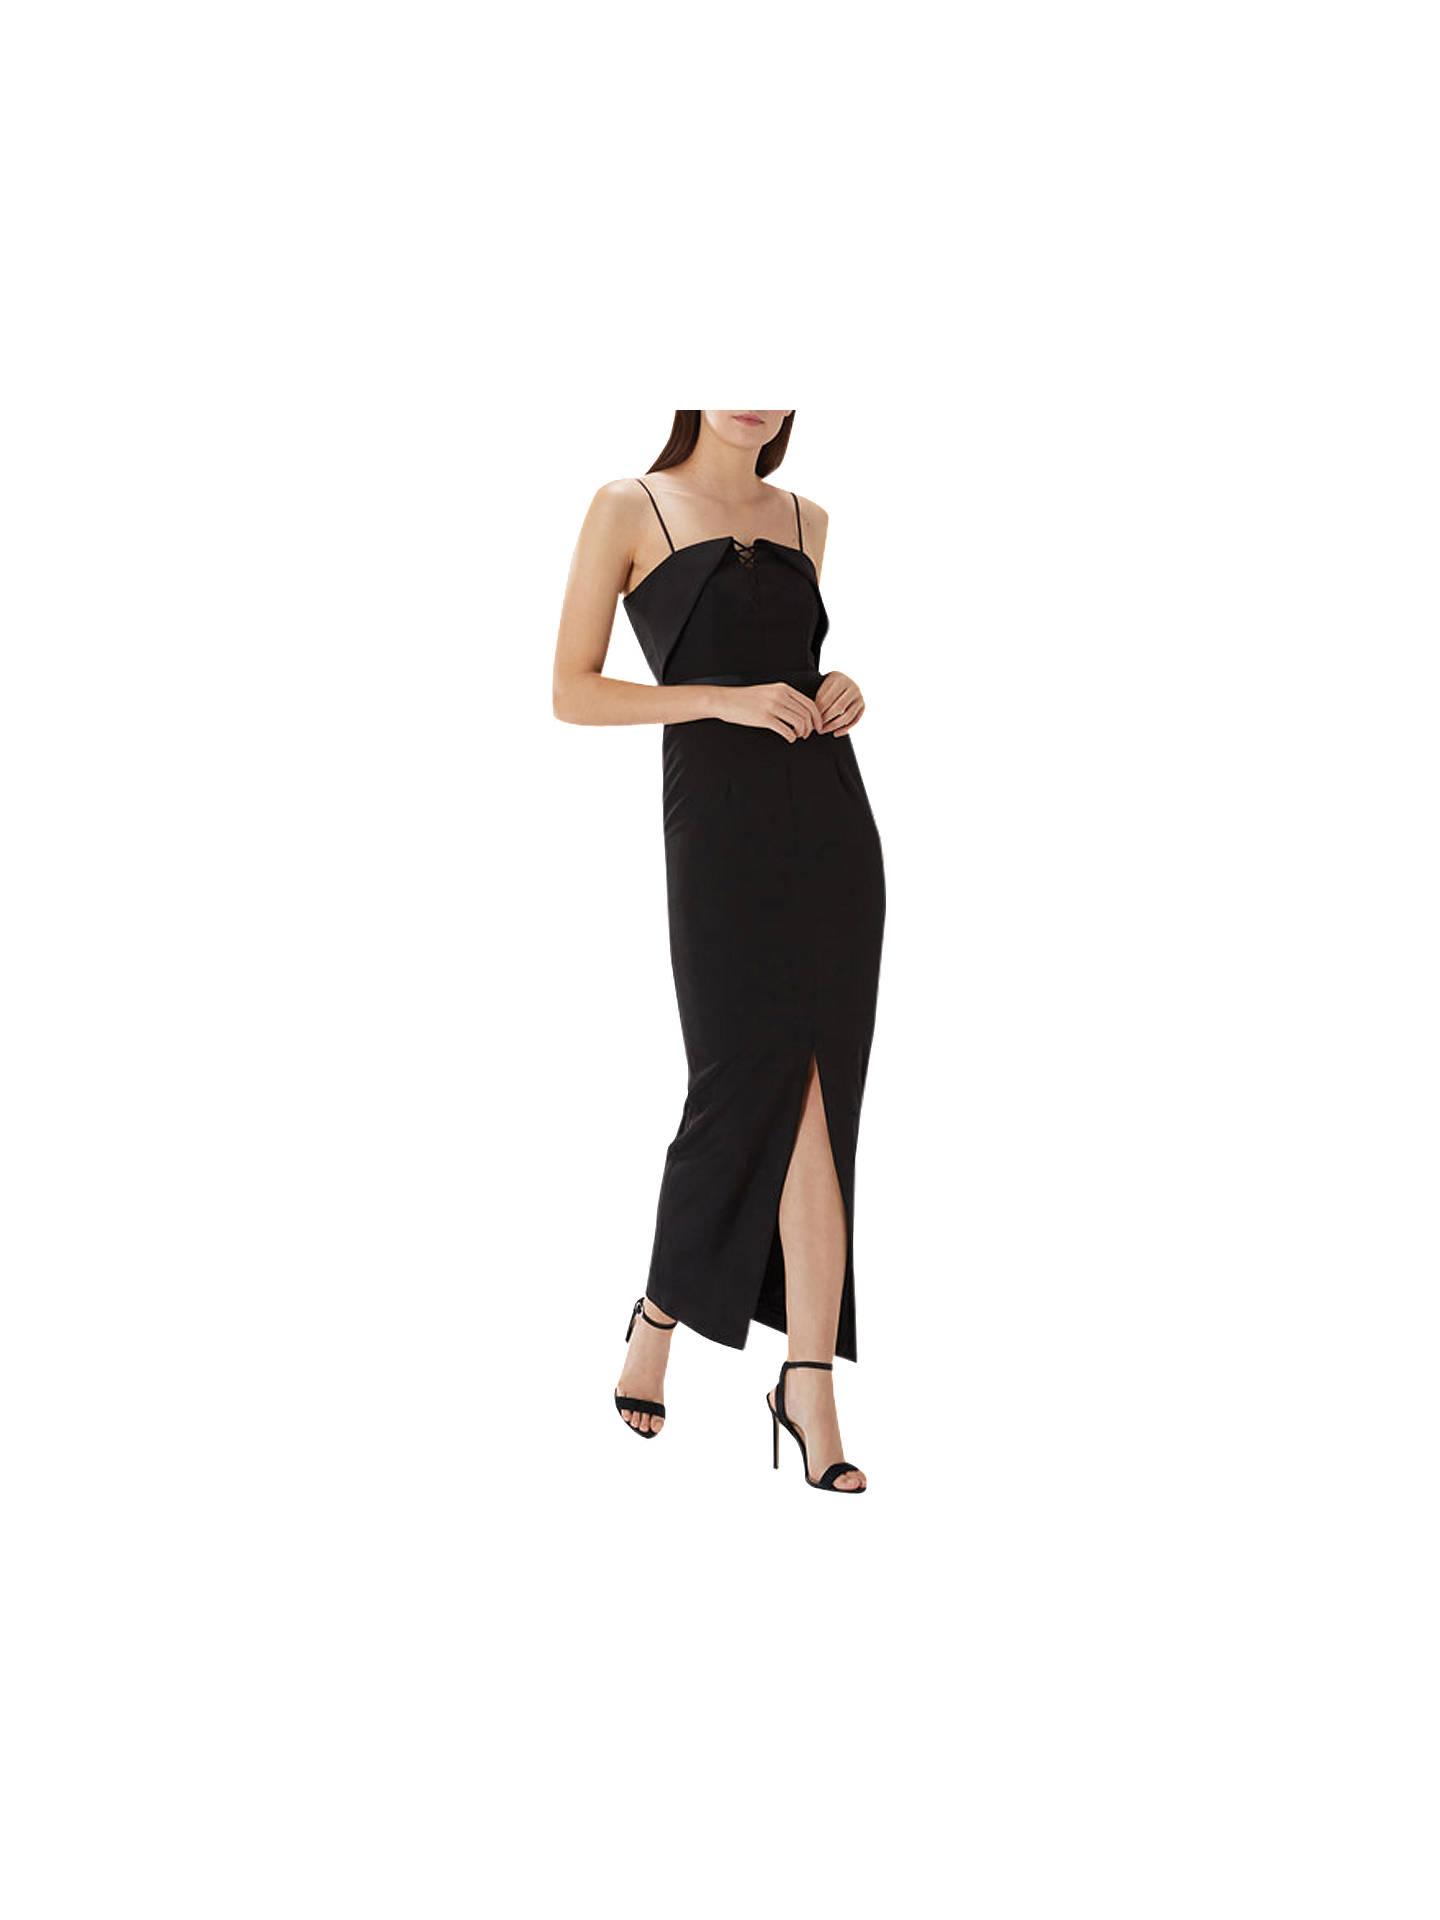 ff124ed65599 Buy Coast Daffodil Eyelet Maxi Dress, Black, 6 Online at johnlewis.com ...